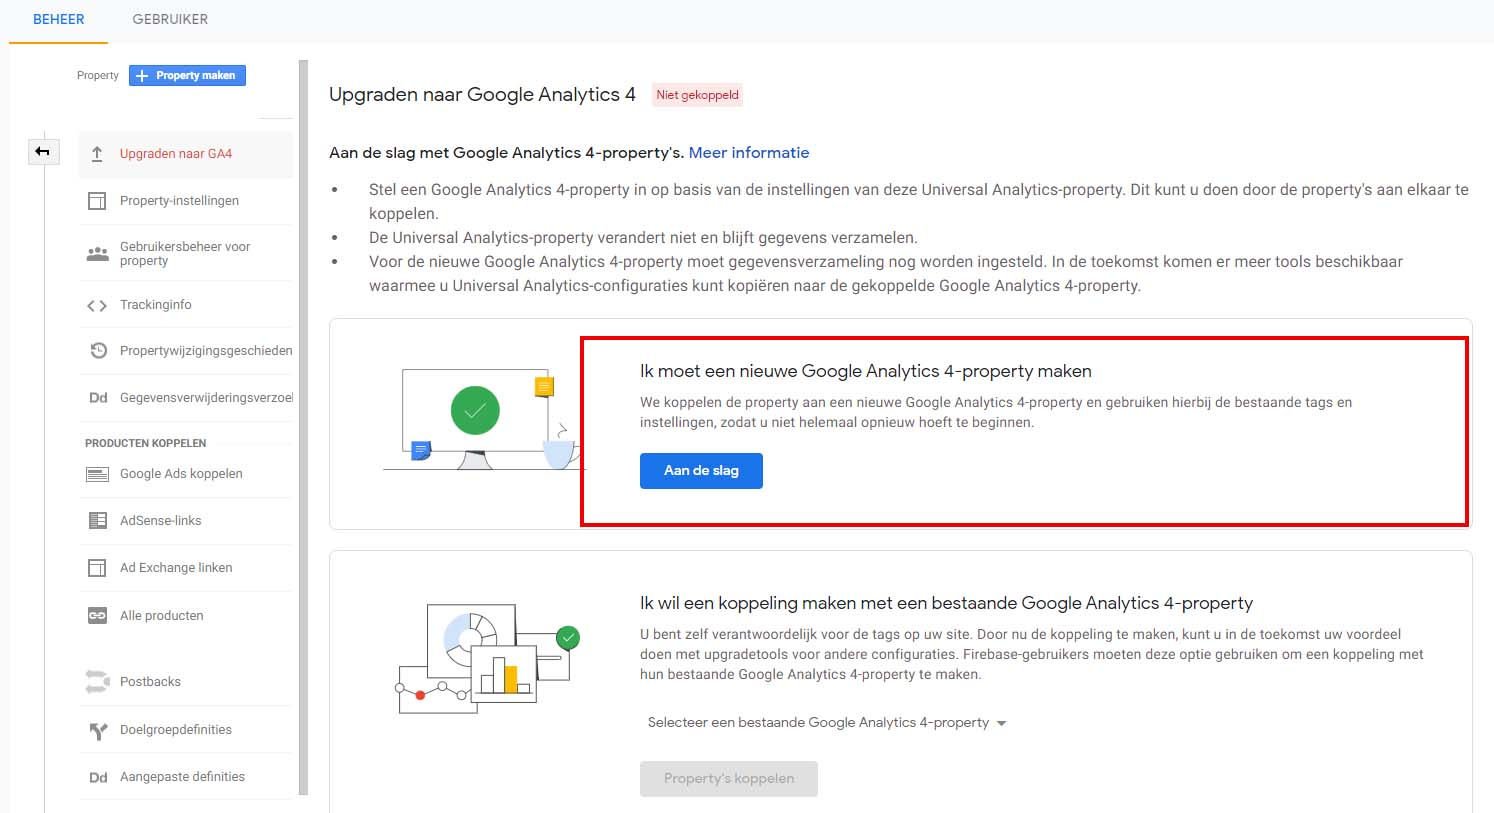 Google Analytics 4 - Stap 2 implementatie